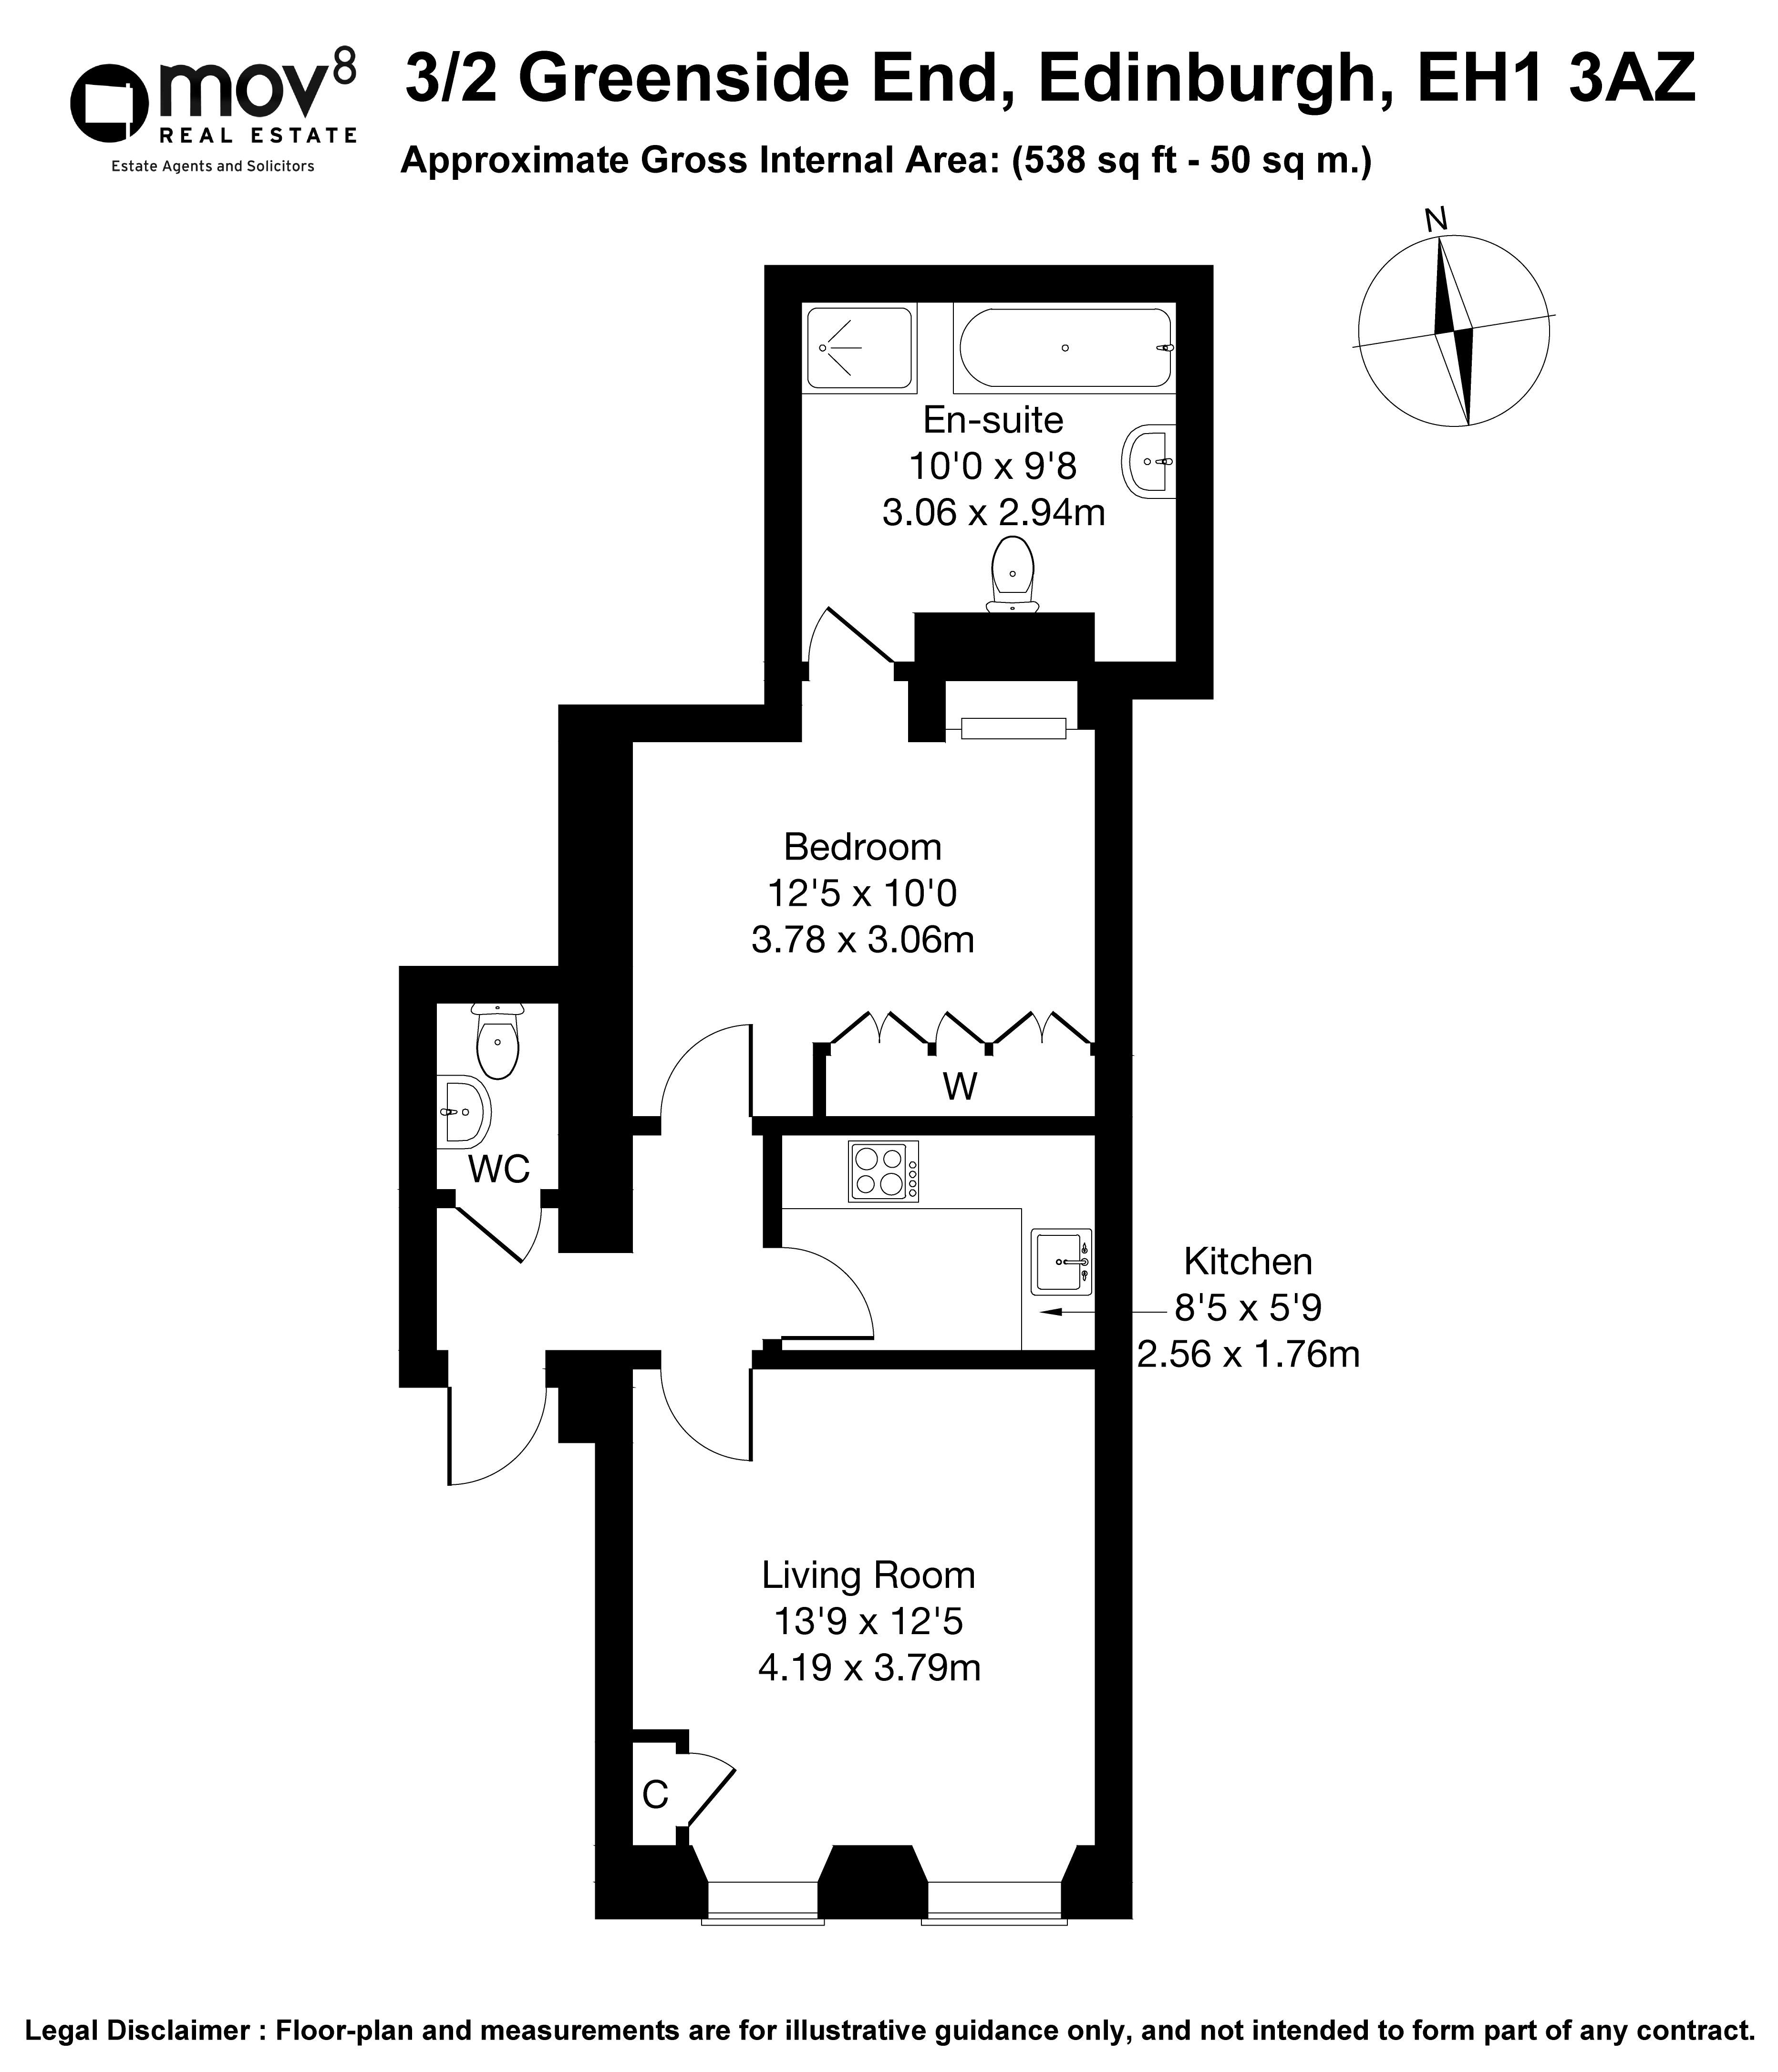 Floorplan 1 of 3/2, Greenside End, Calton, Edinburgh, EH1 3AZ